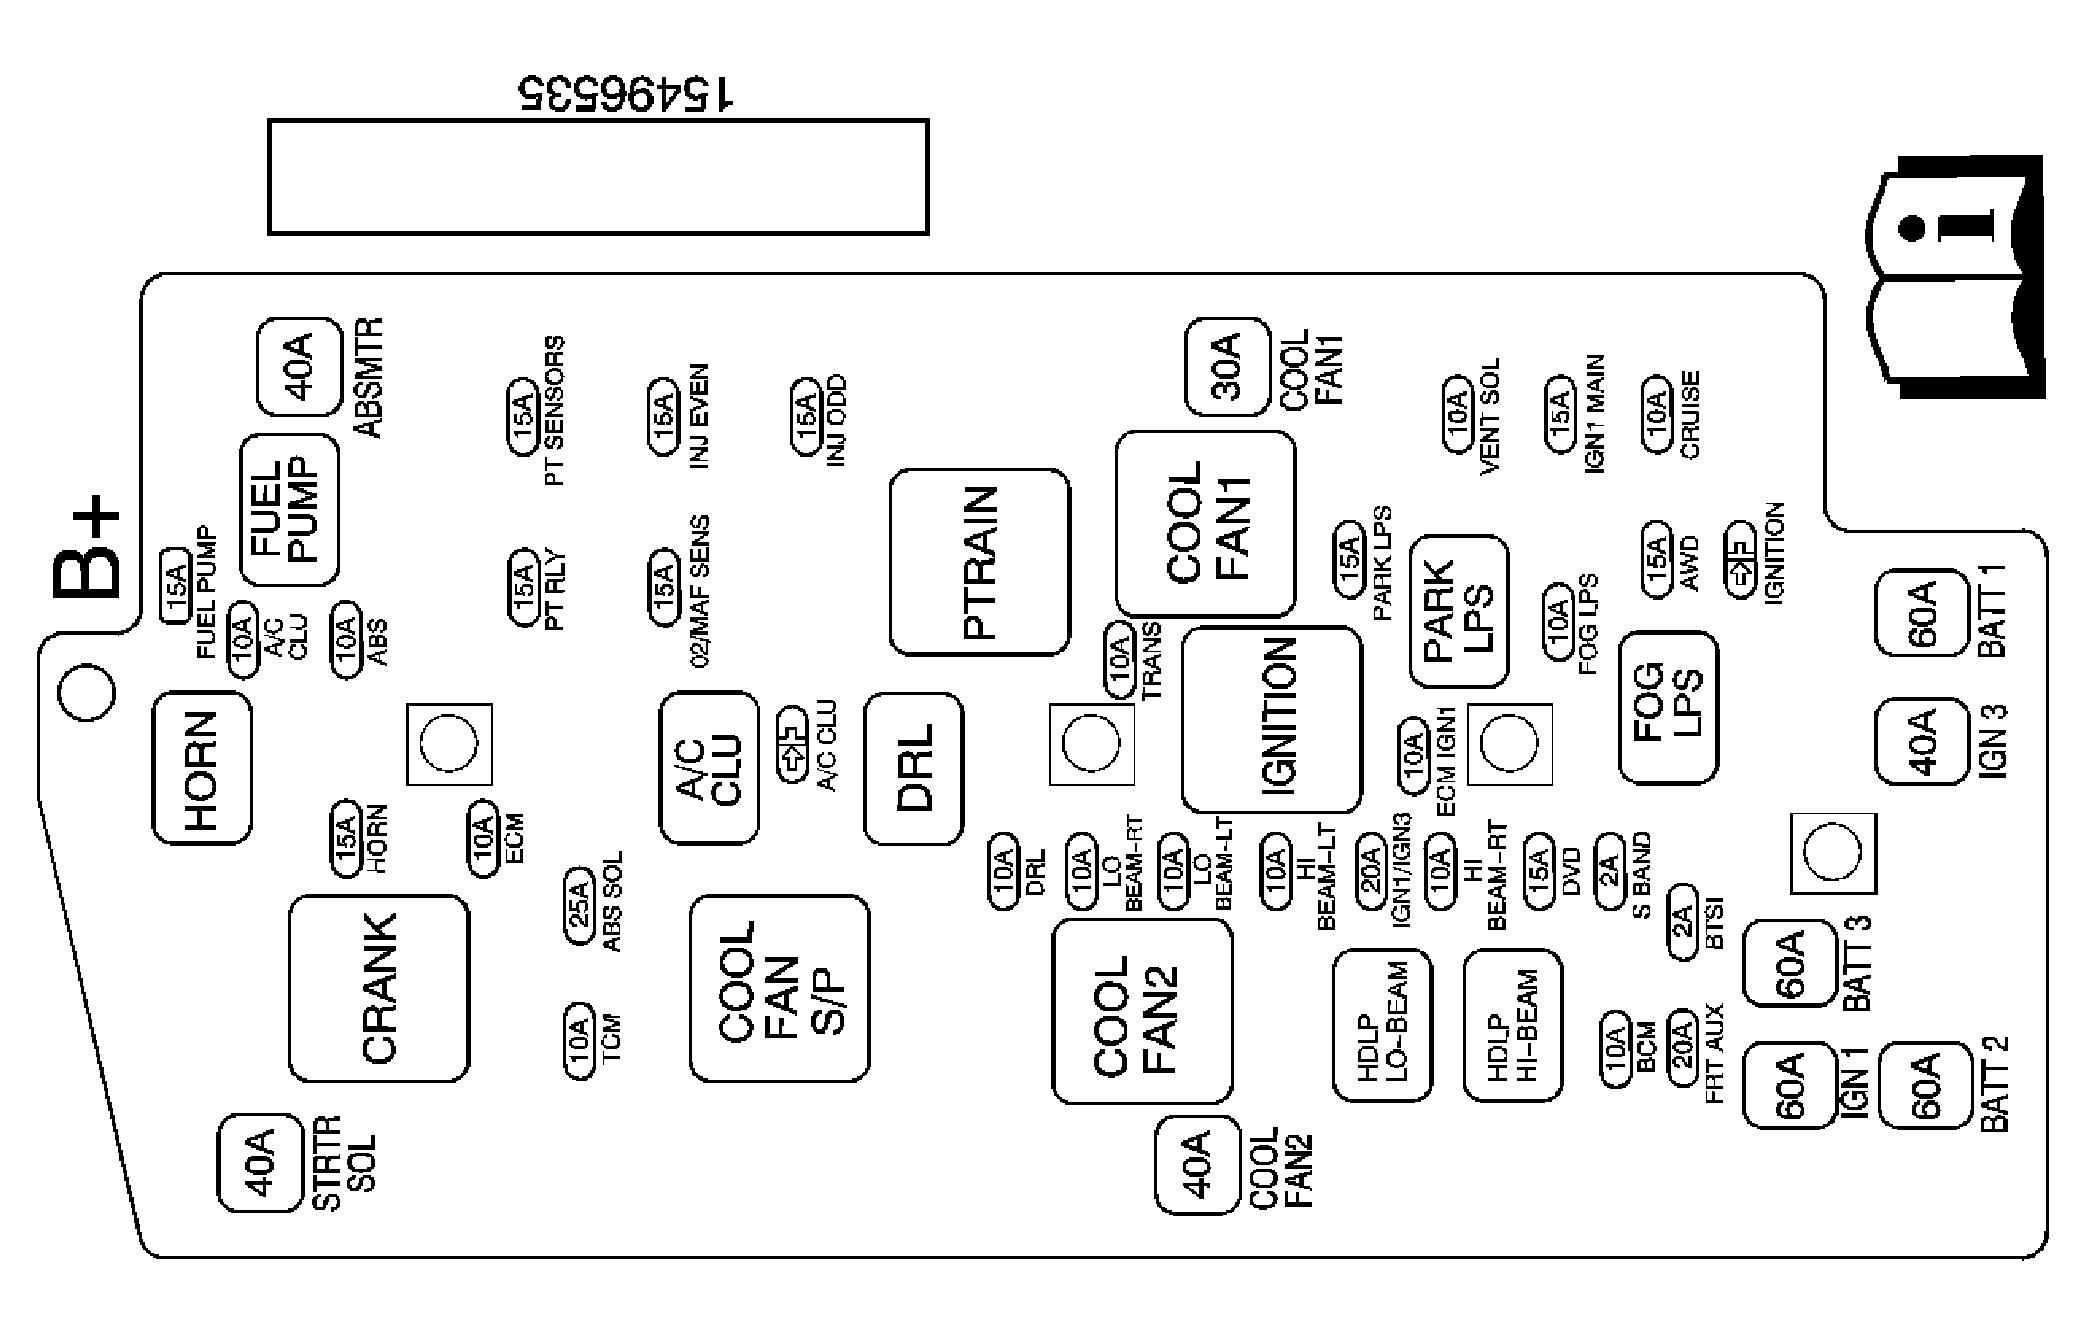 hyundai excel stereo wiring diagram 2016 nissan versa note radio 2007 santa fe tail light html